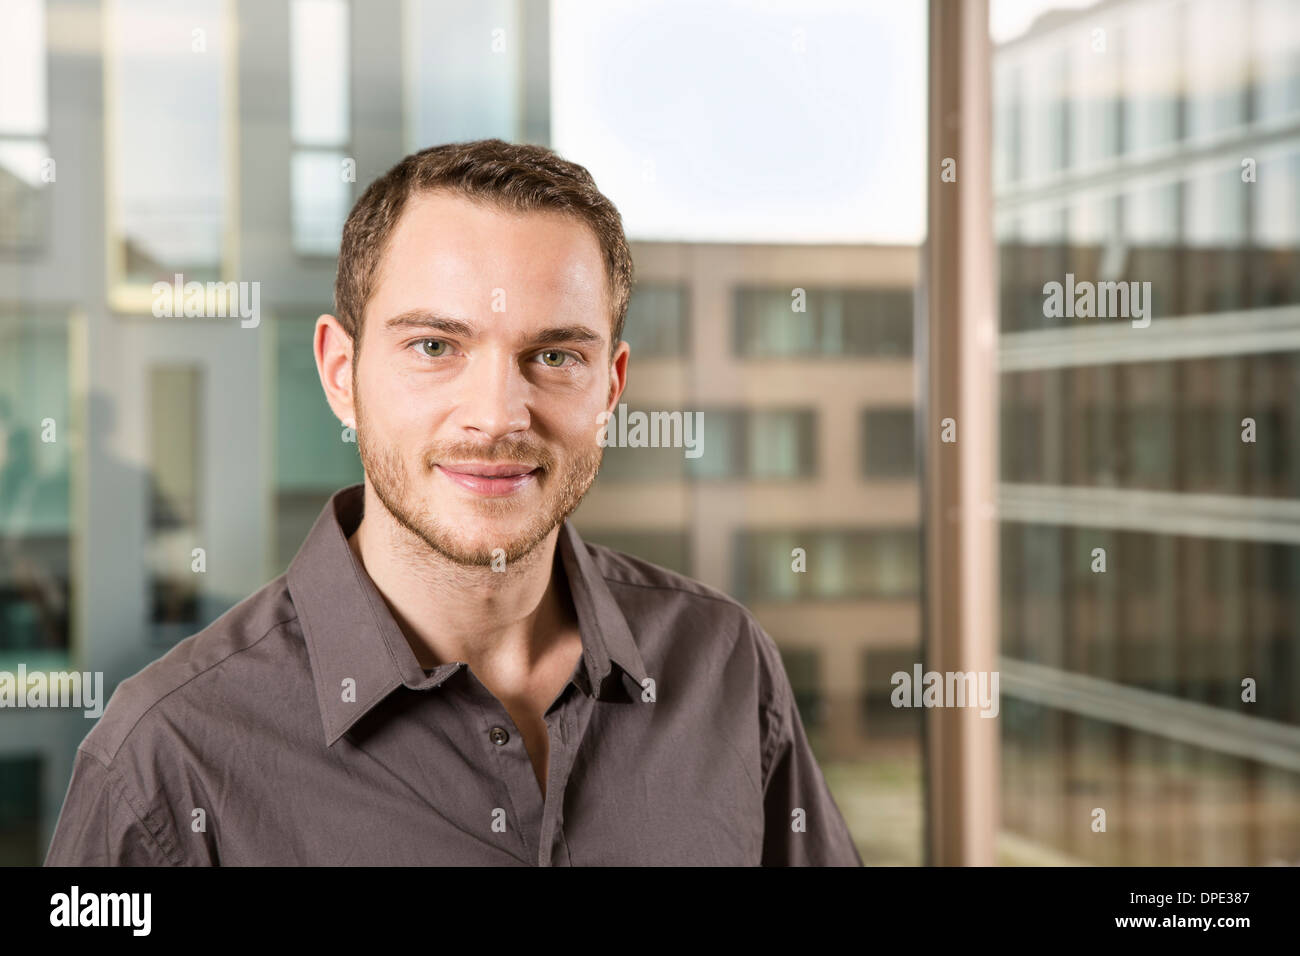 Portrait of businessman Photo Stock